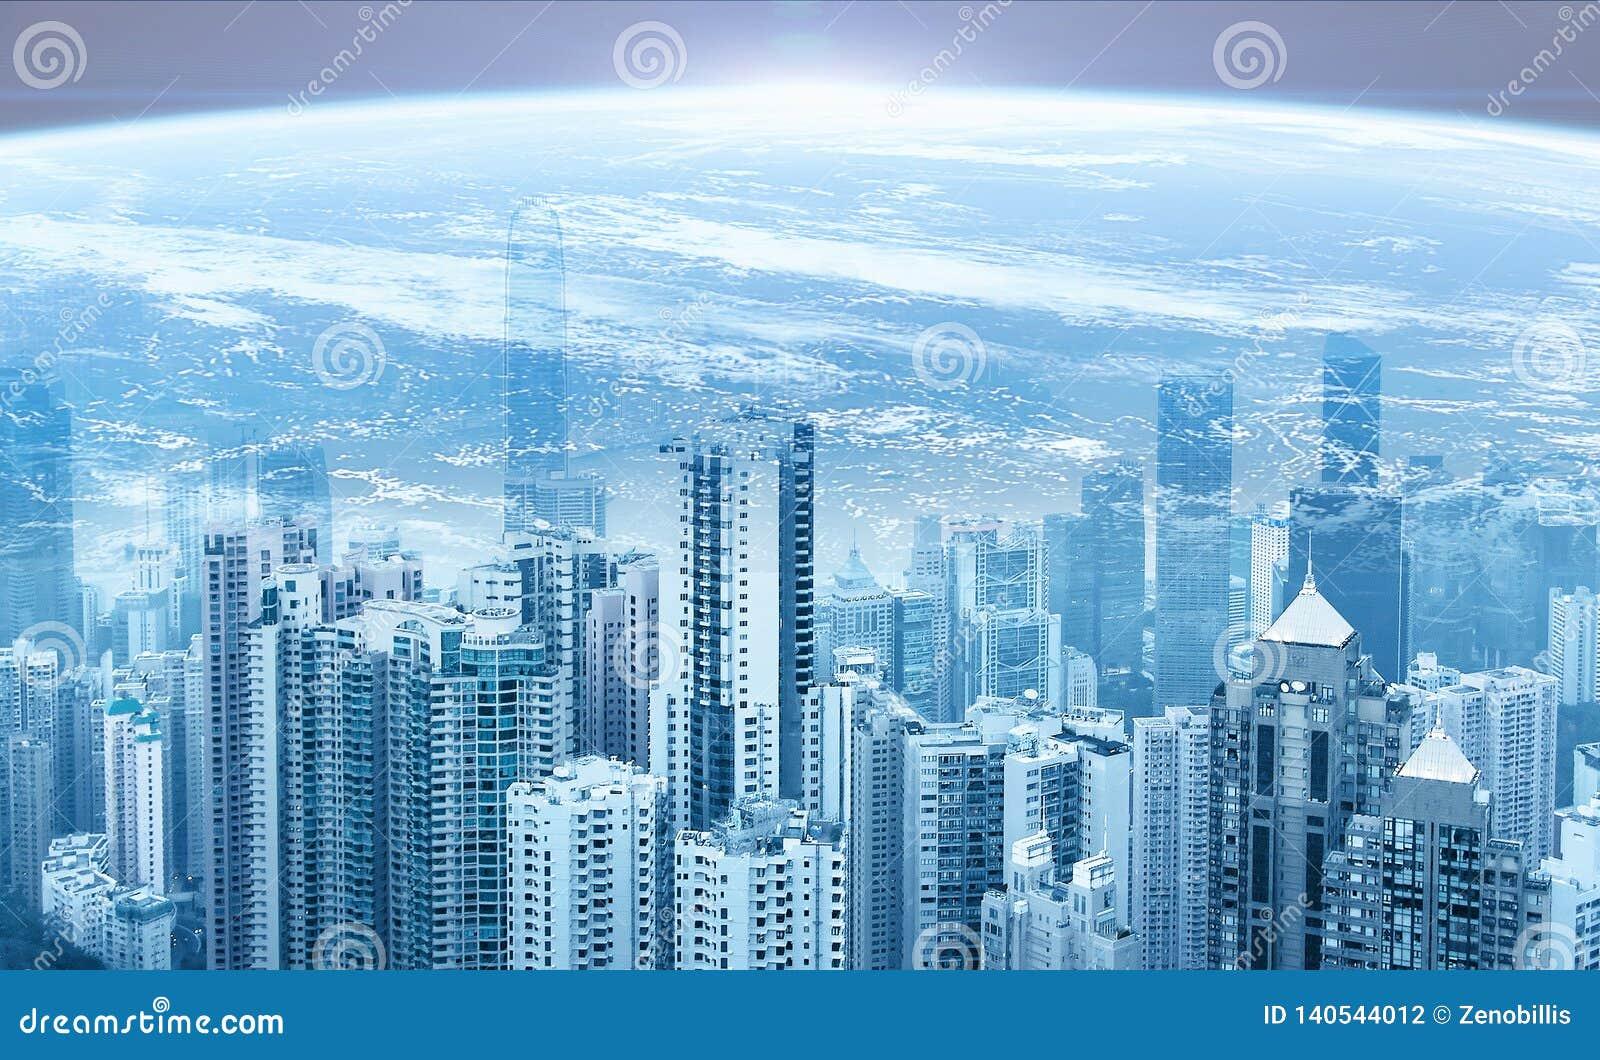 Modern urban skyline. Planet Earth. Sunrise. Global communications and networking